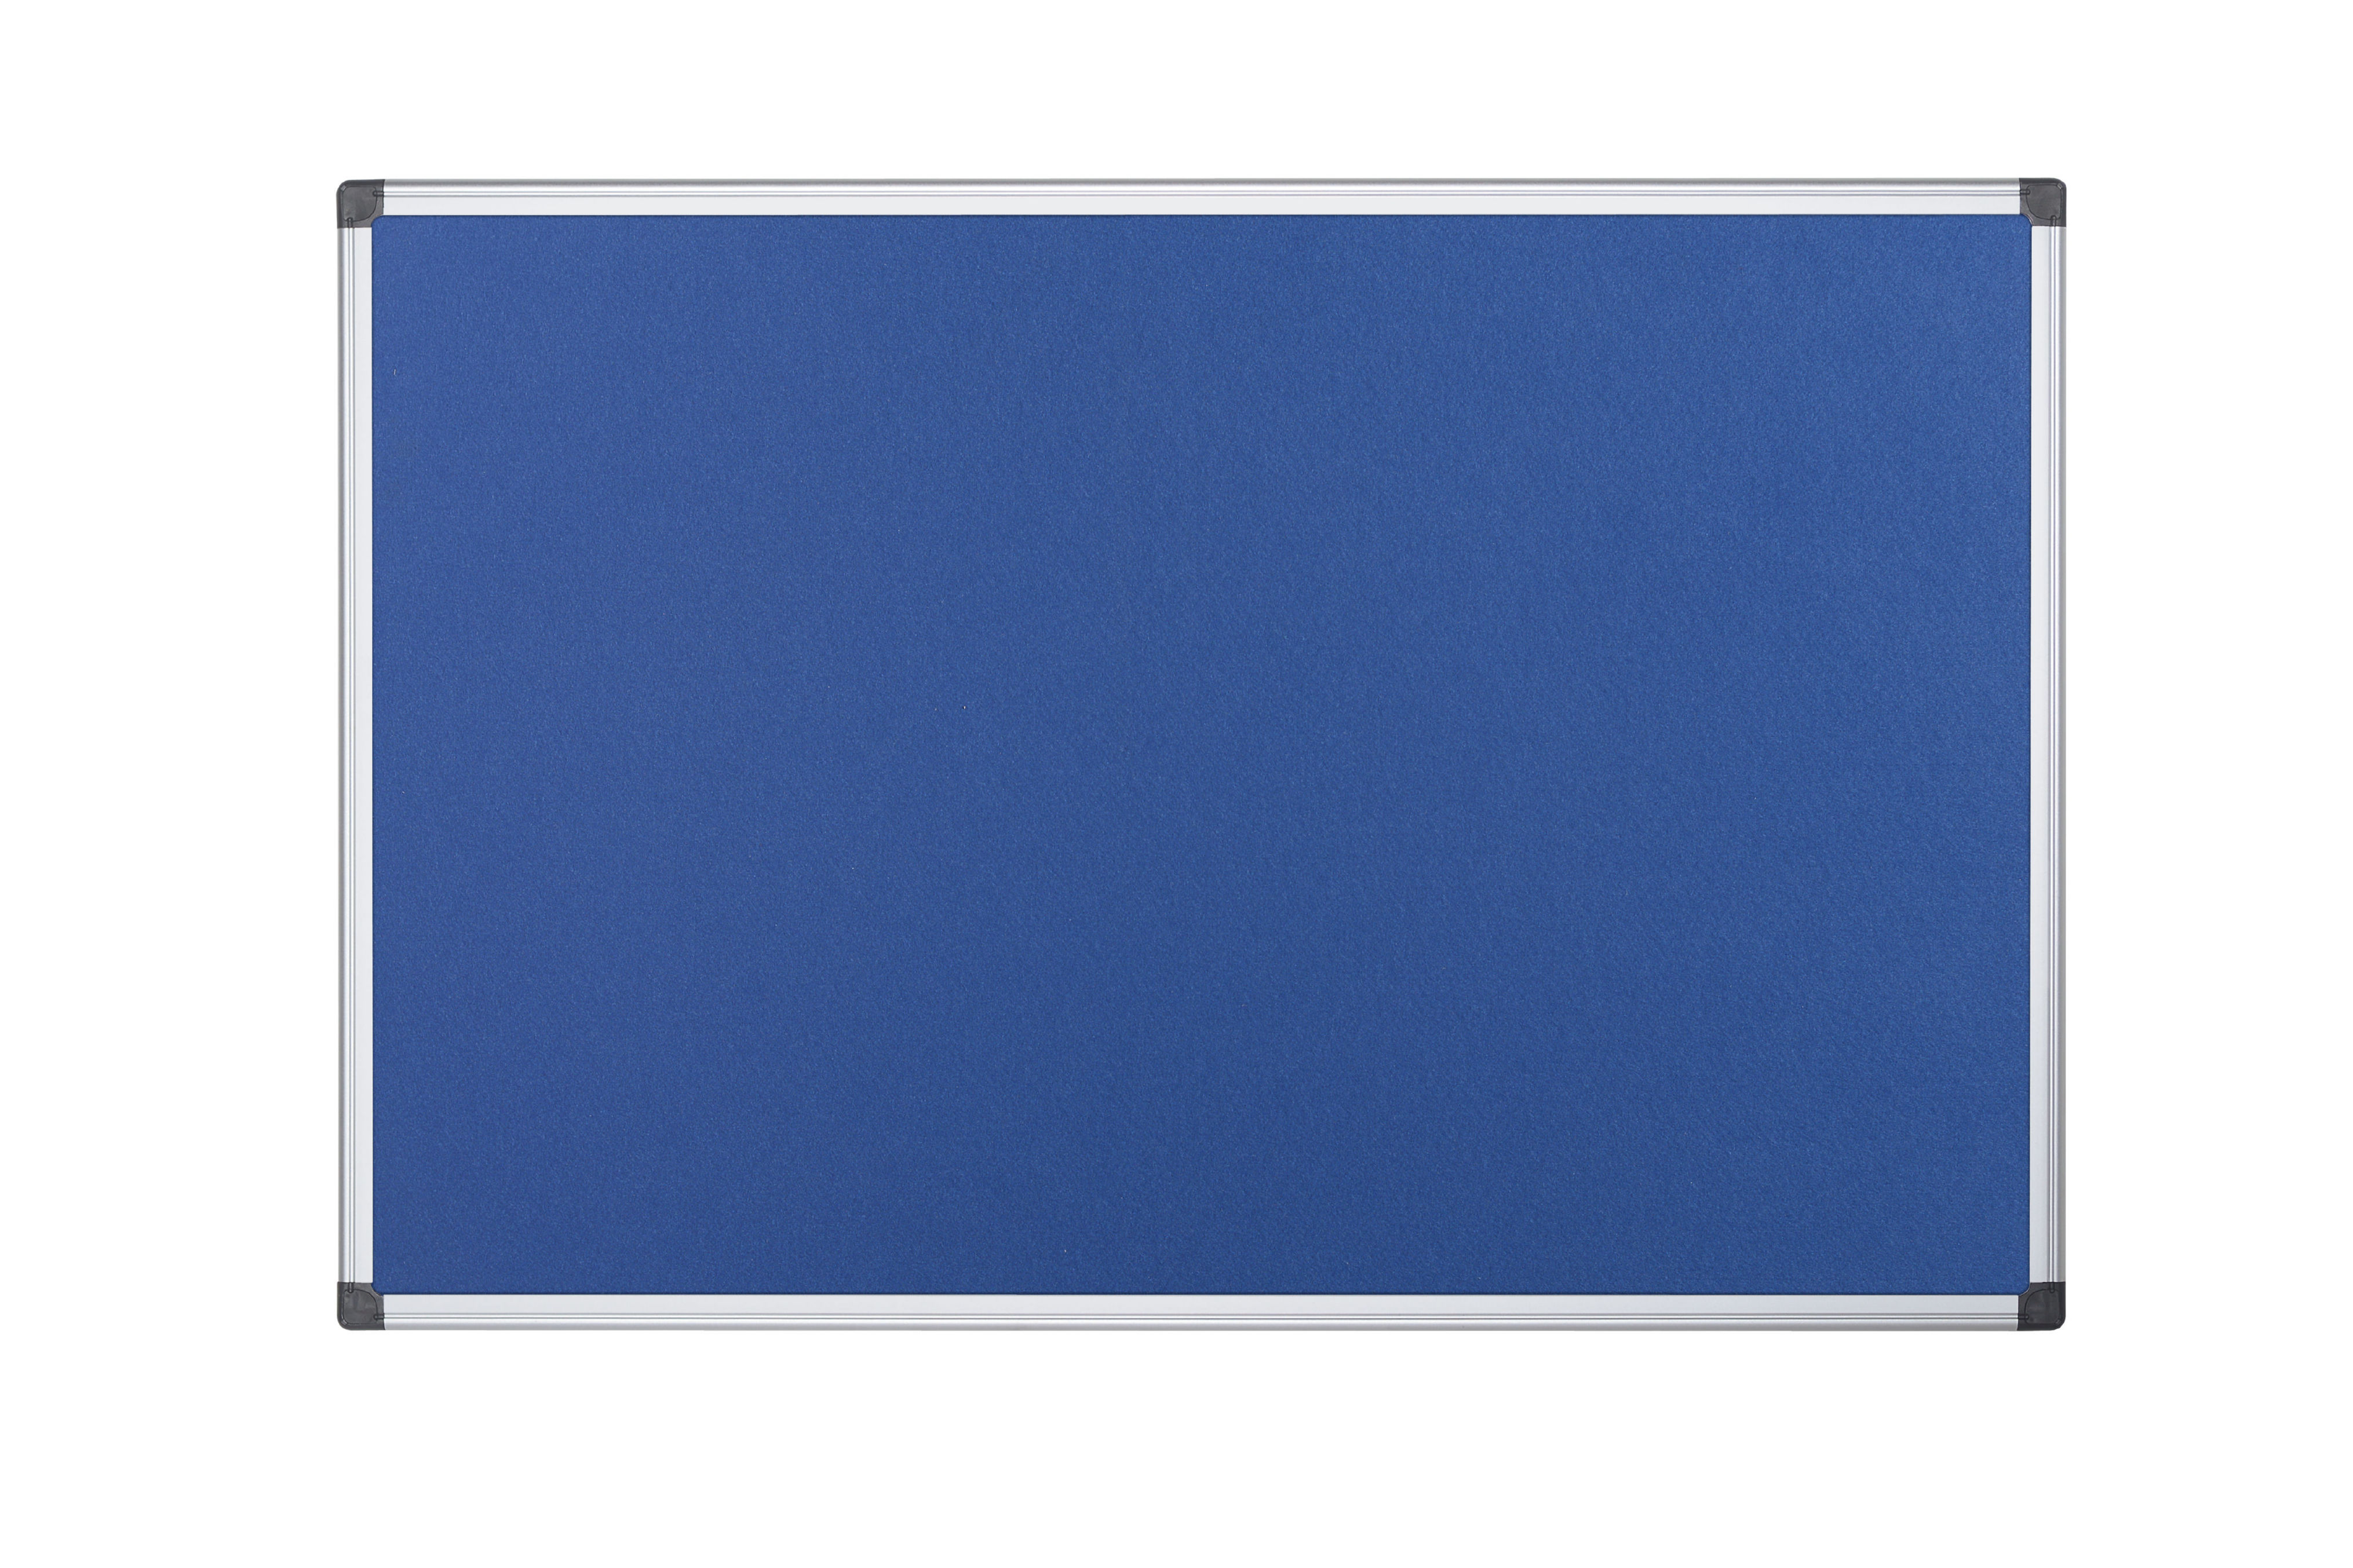 Felt Bi-Office Maya Blue Felt Noticeboard Aluminium Frame 1200x1200mm